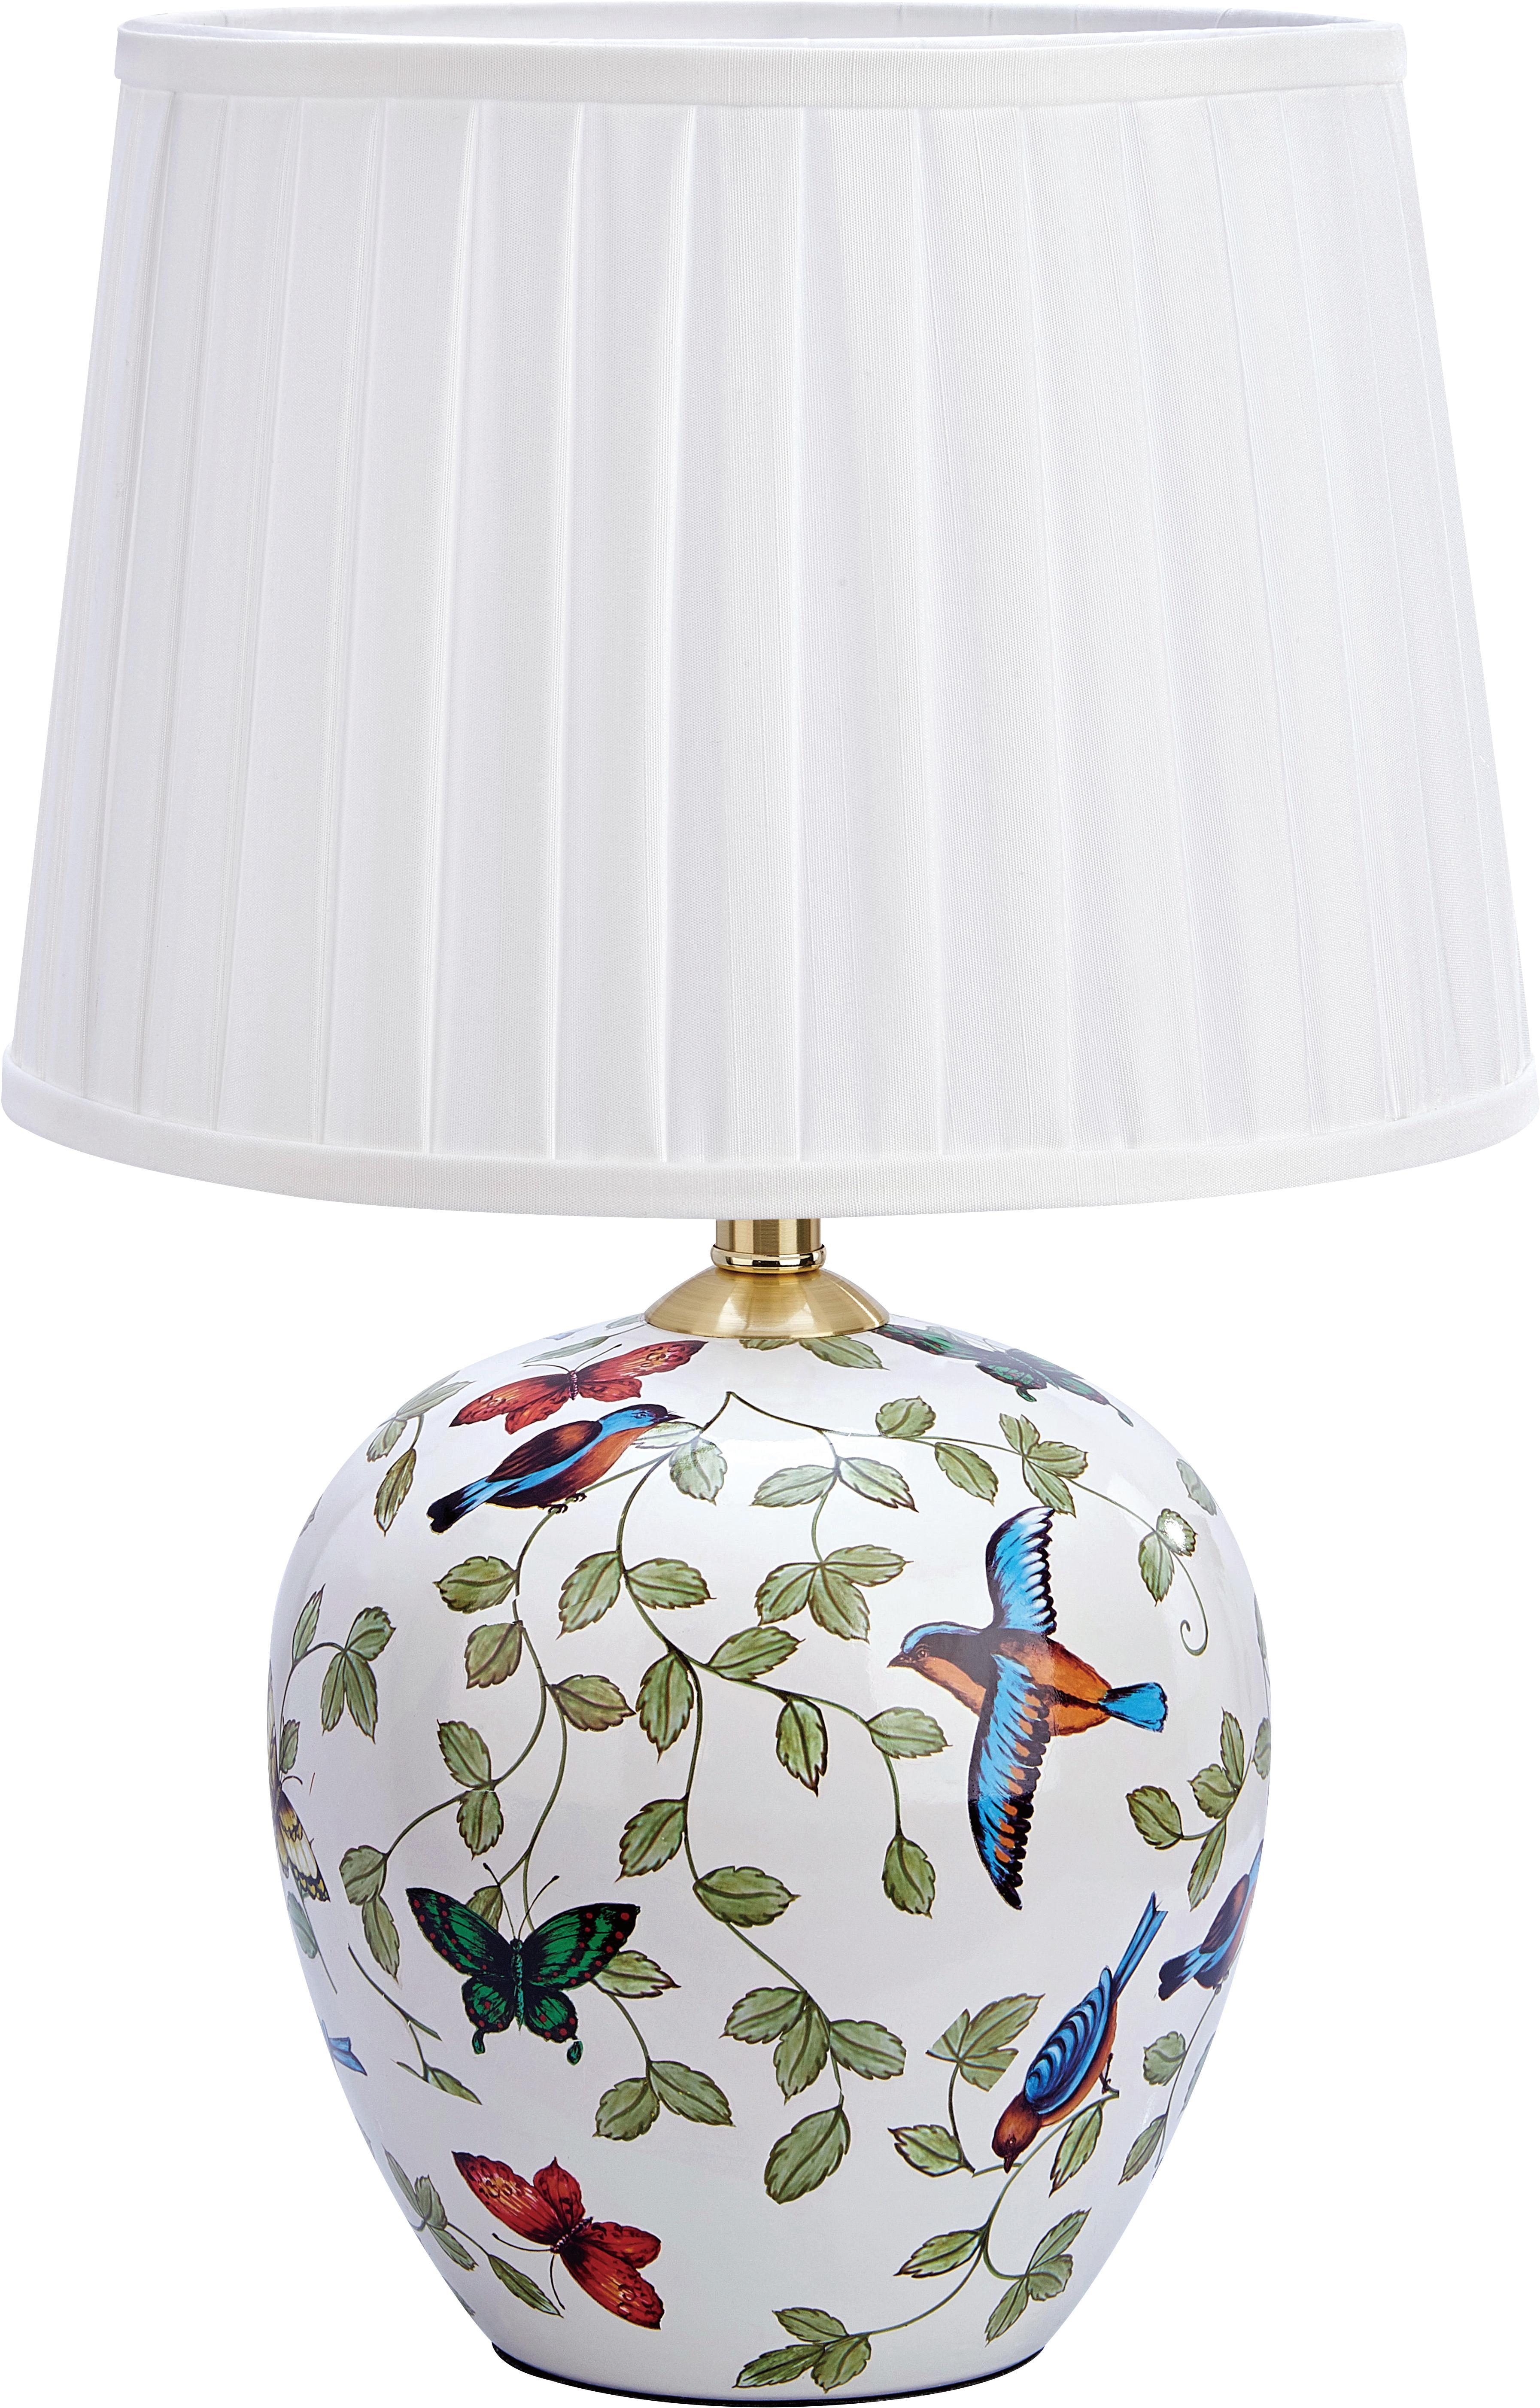 Tafellamp Mansion, Lampenkap: textiel, Lampvoet: keramiek, Wit, multicolour, Ø 31 x H 45 cm